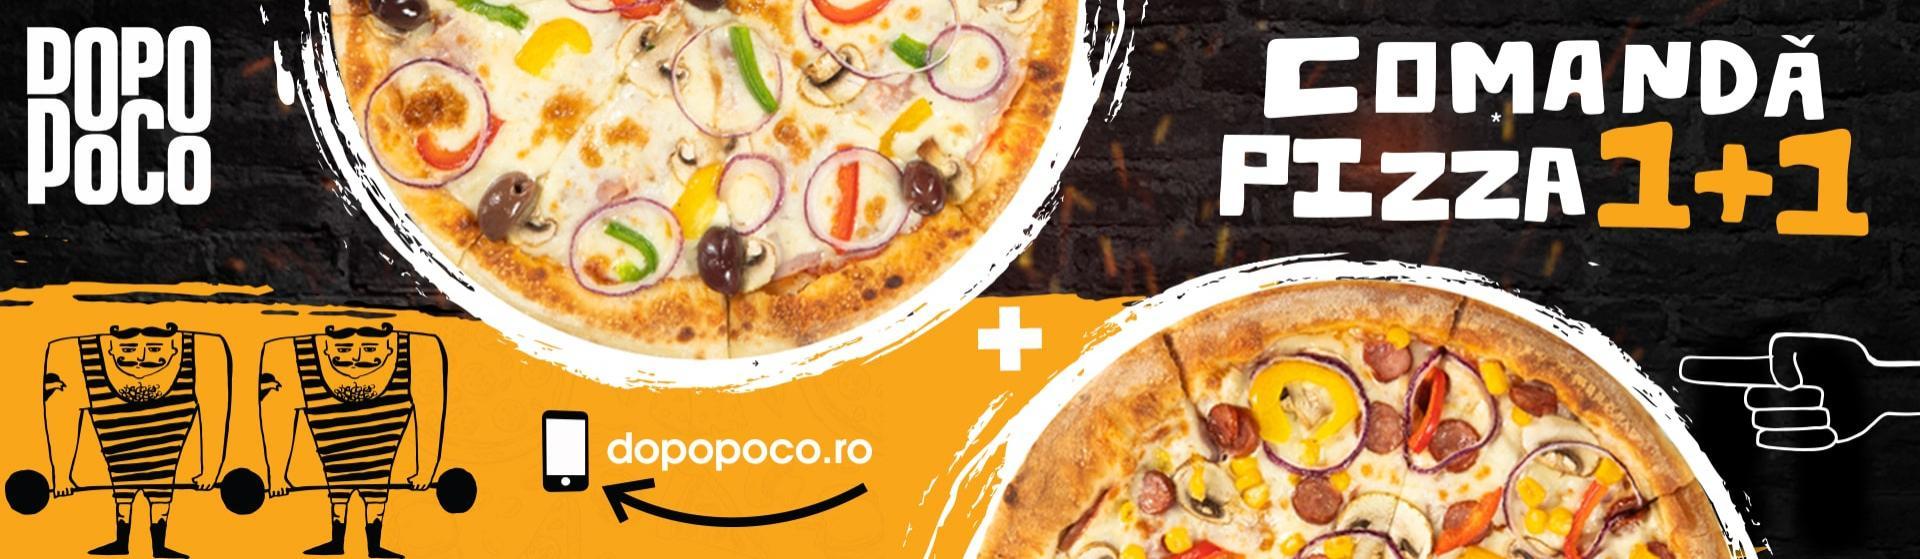 Banner-categorie-pizza-1-plus-1